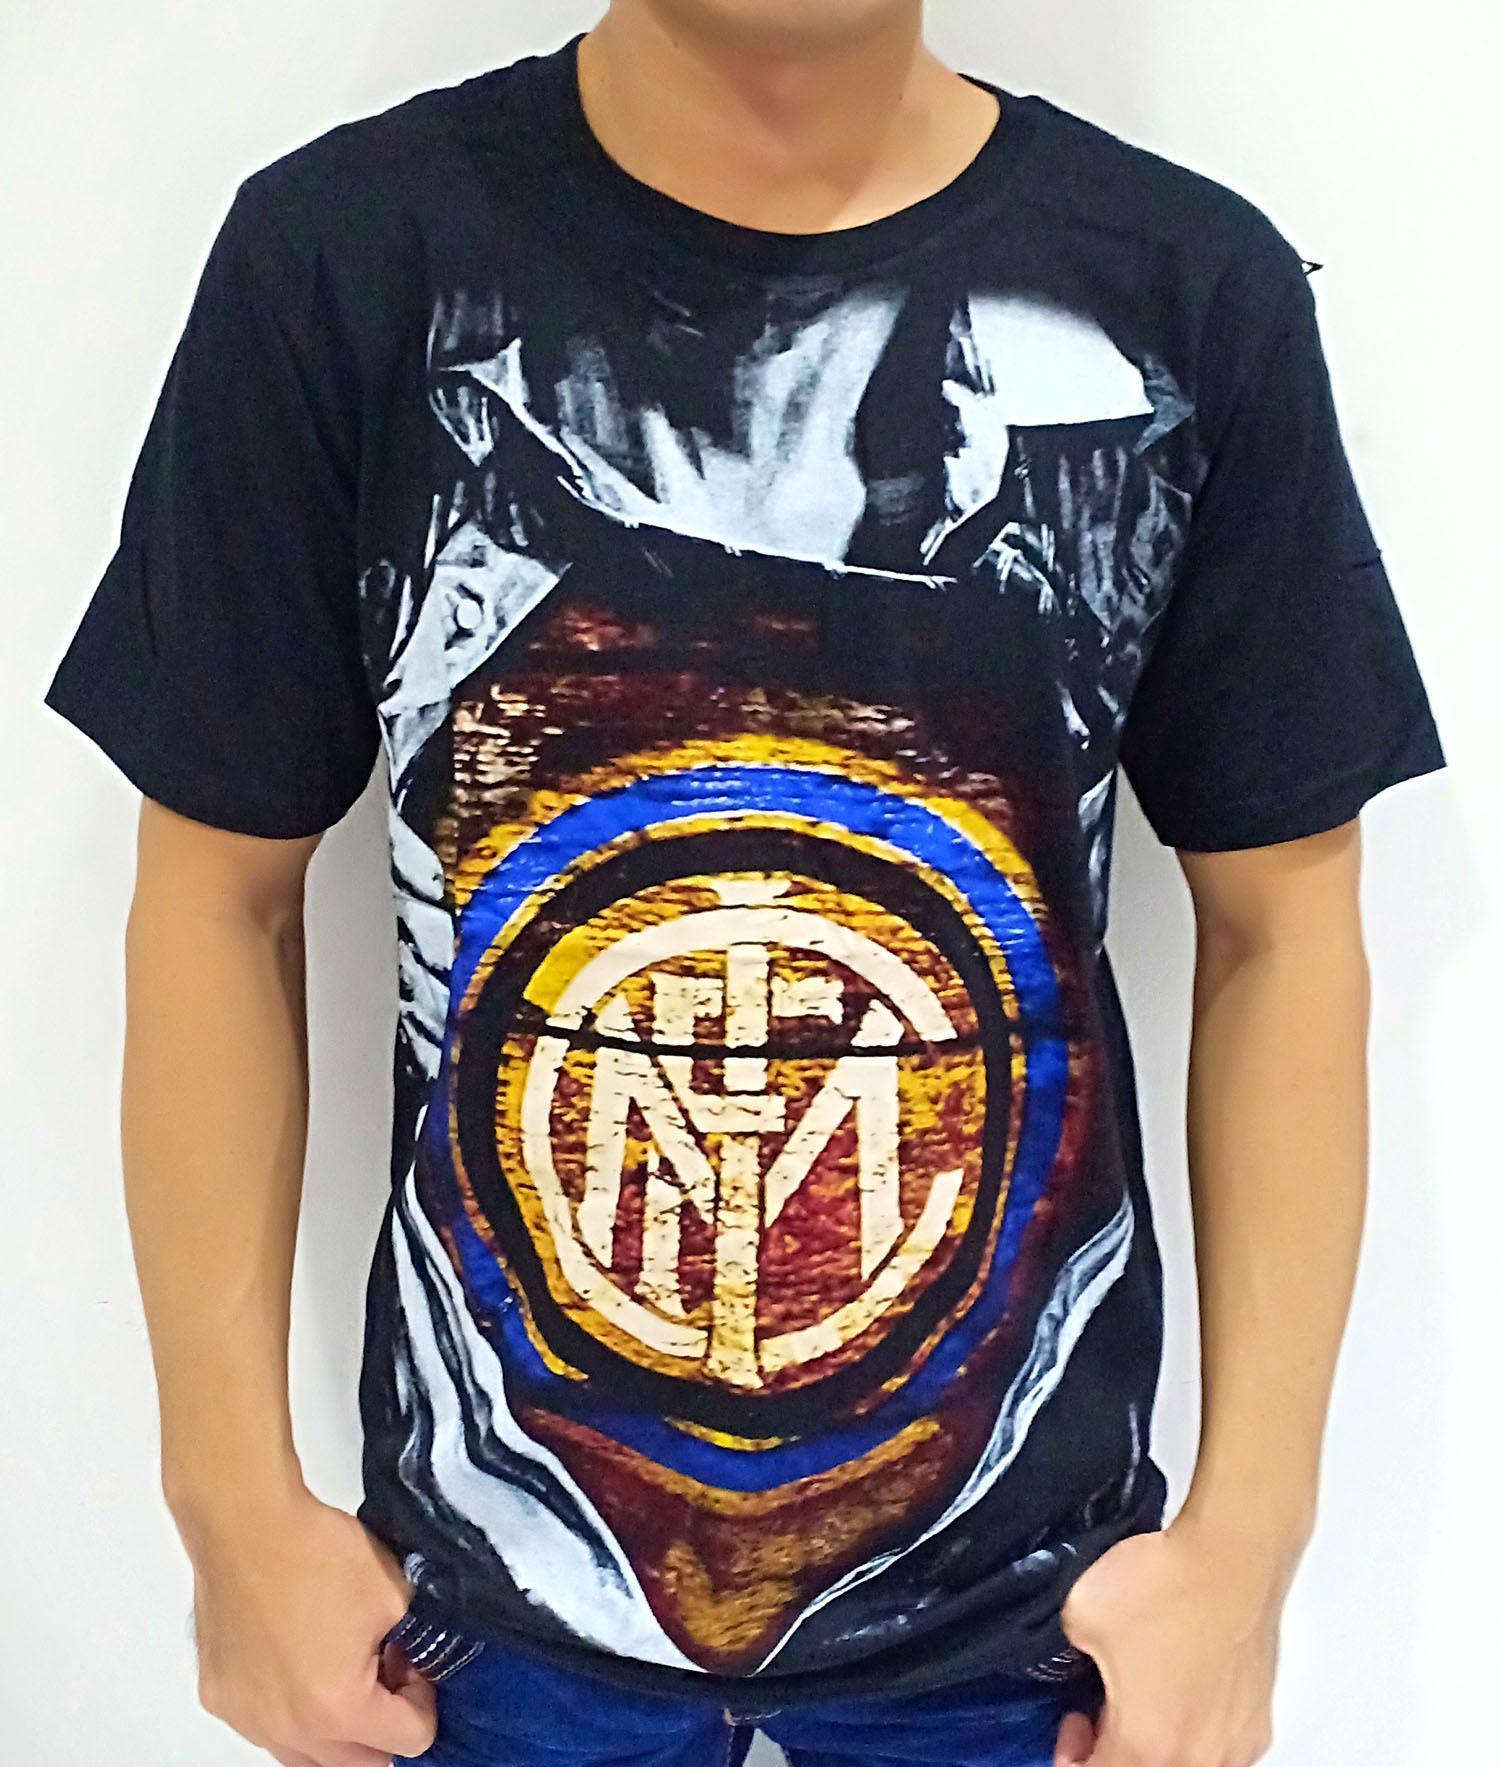 Home; Cikitashop - Kaos T-Shirt Distro / Kaos Pria / T-Shirt